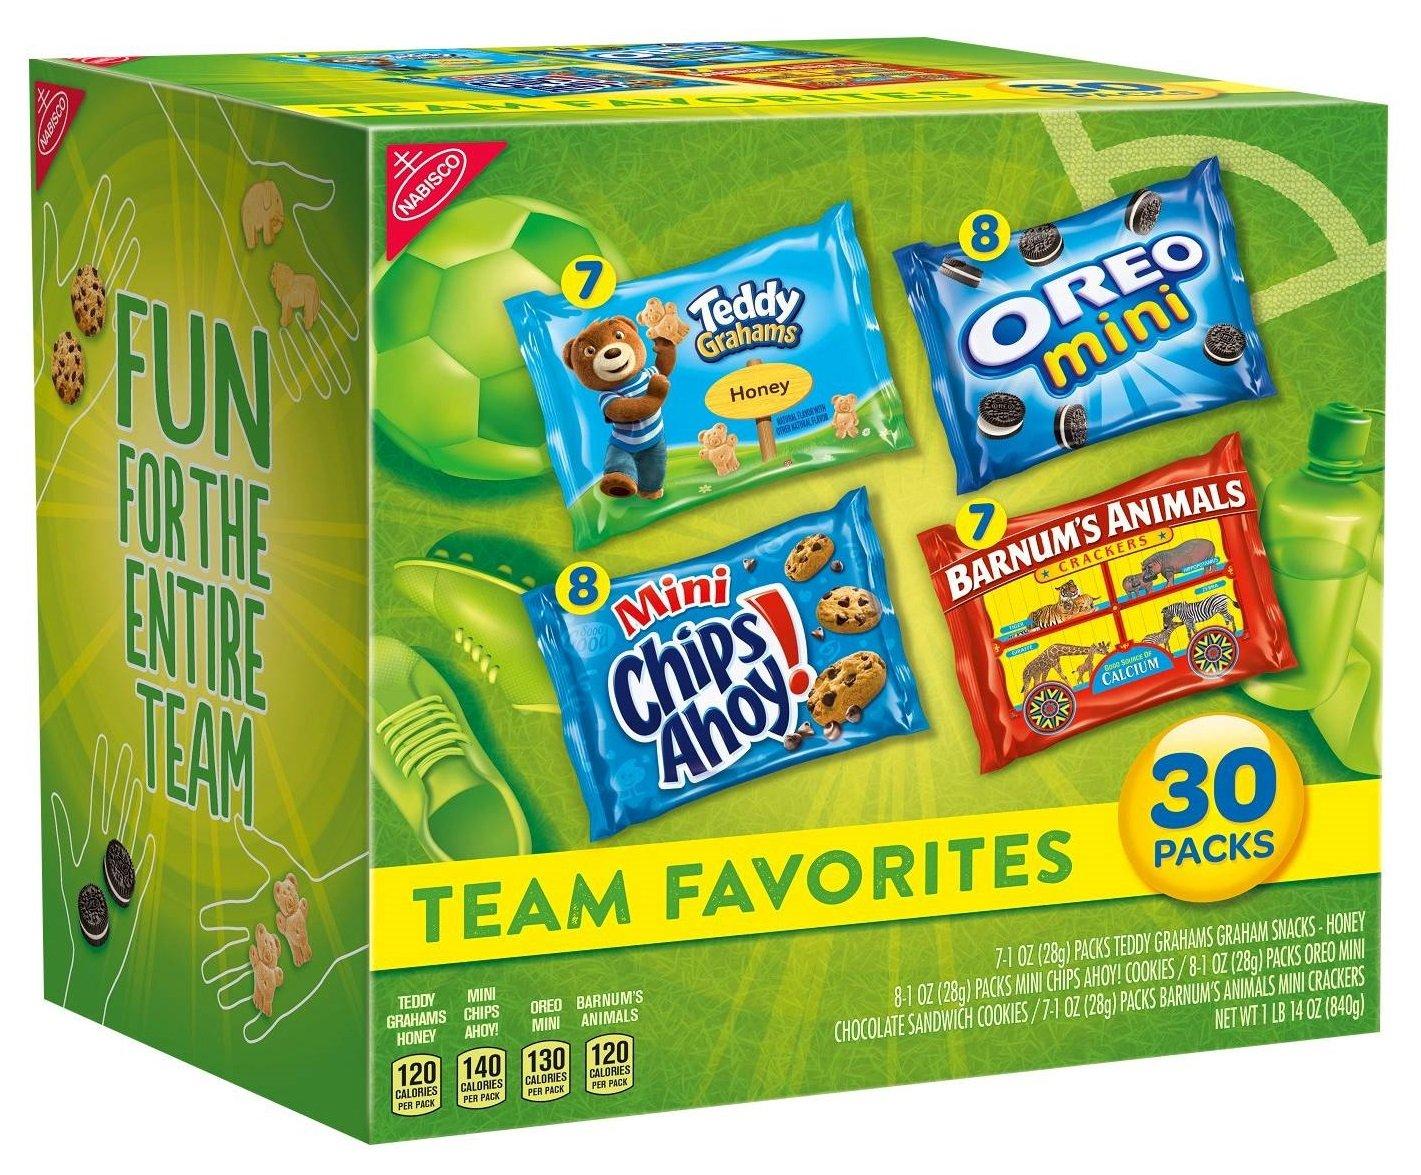 30-Pack Nabisco Team Favorites Cookies & Crackers Variety Pack $6.00 5% or $5.37 15% w/s&s & MORE